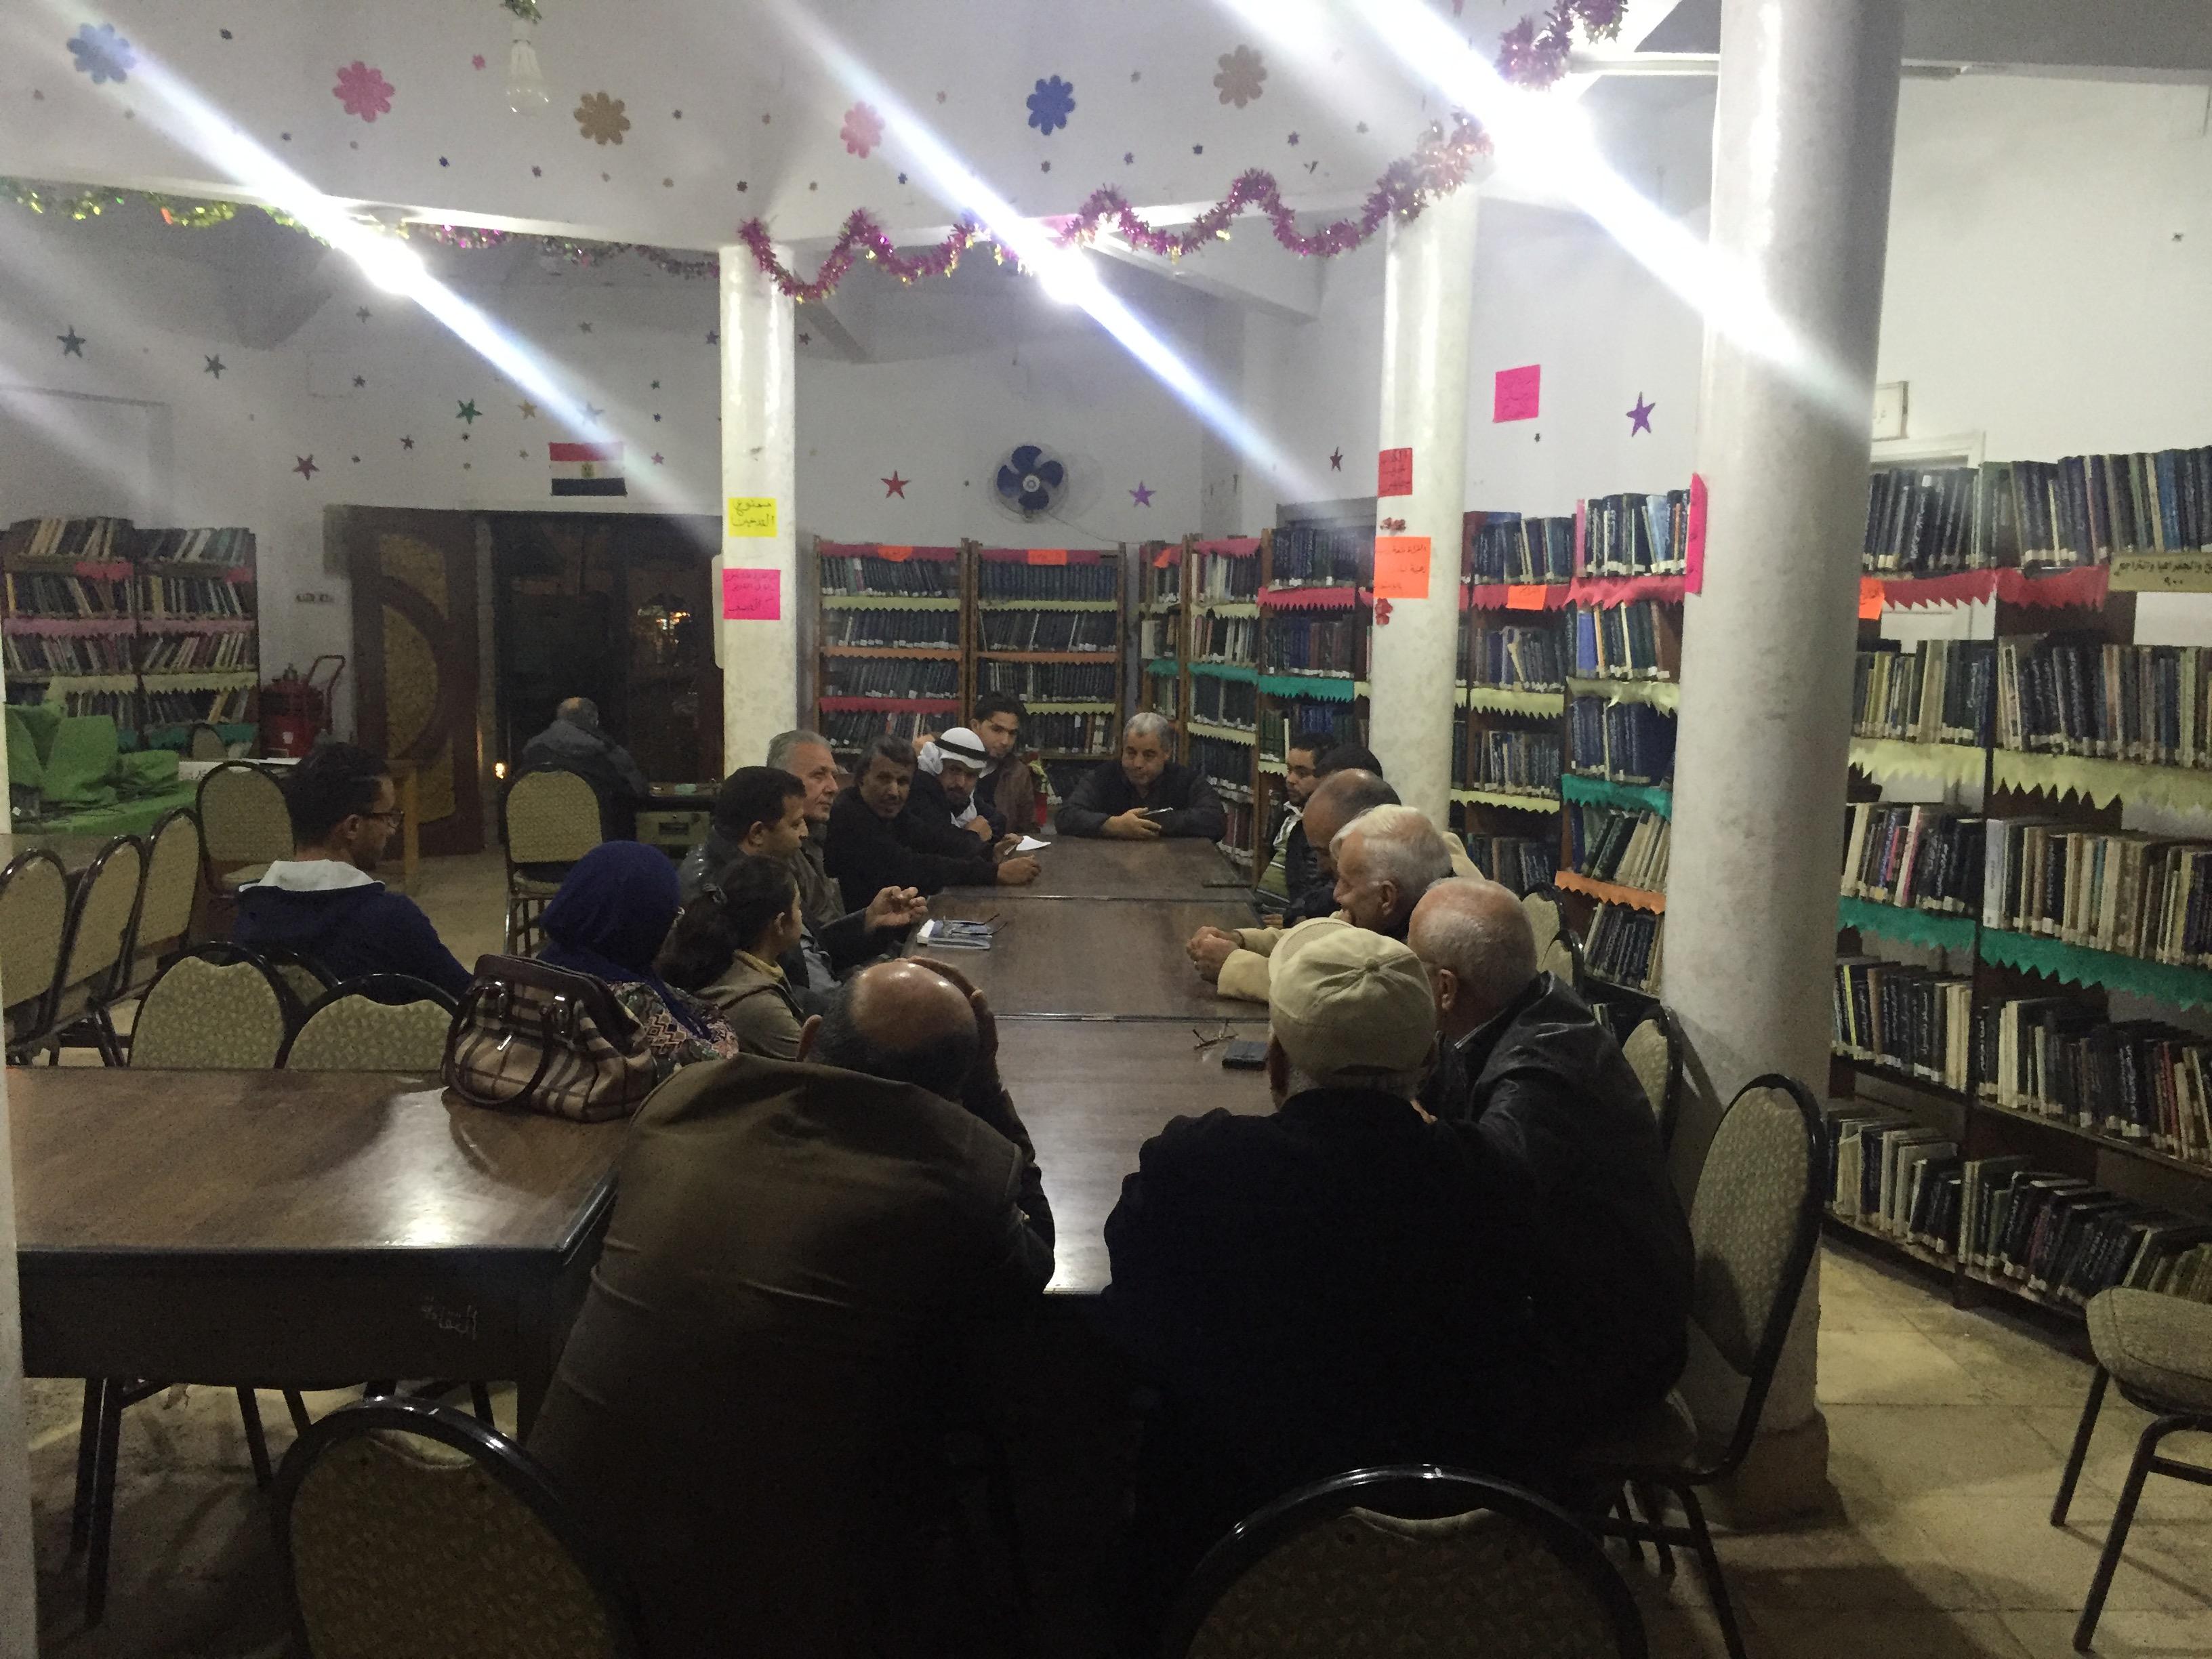 95dc1266c https://www.youm7.com/story/2017/12/28/برج-العرب-يفتح-أبوابه-6 ...